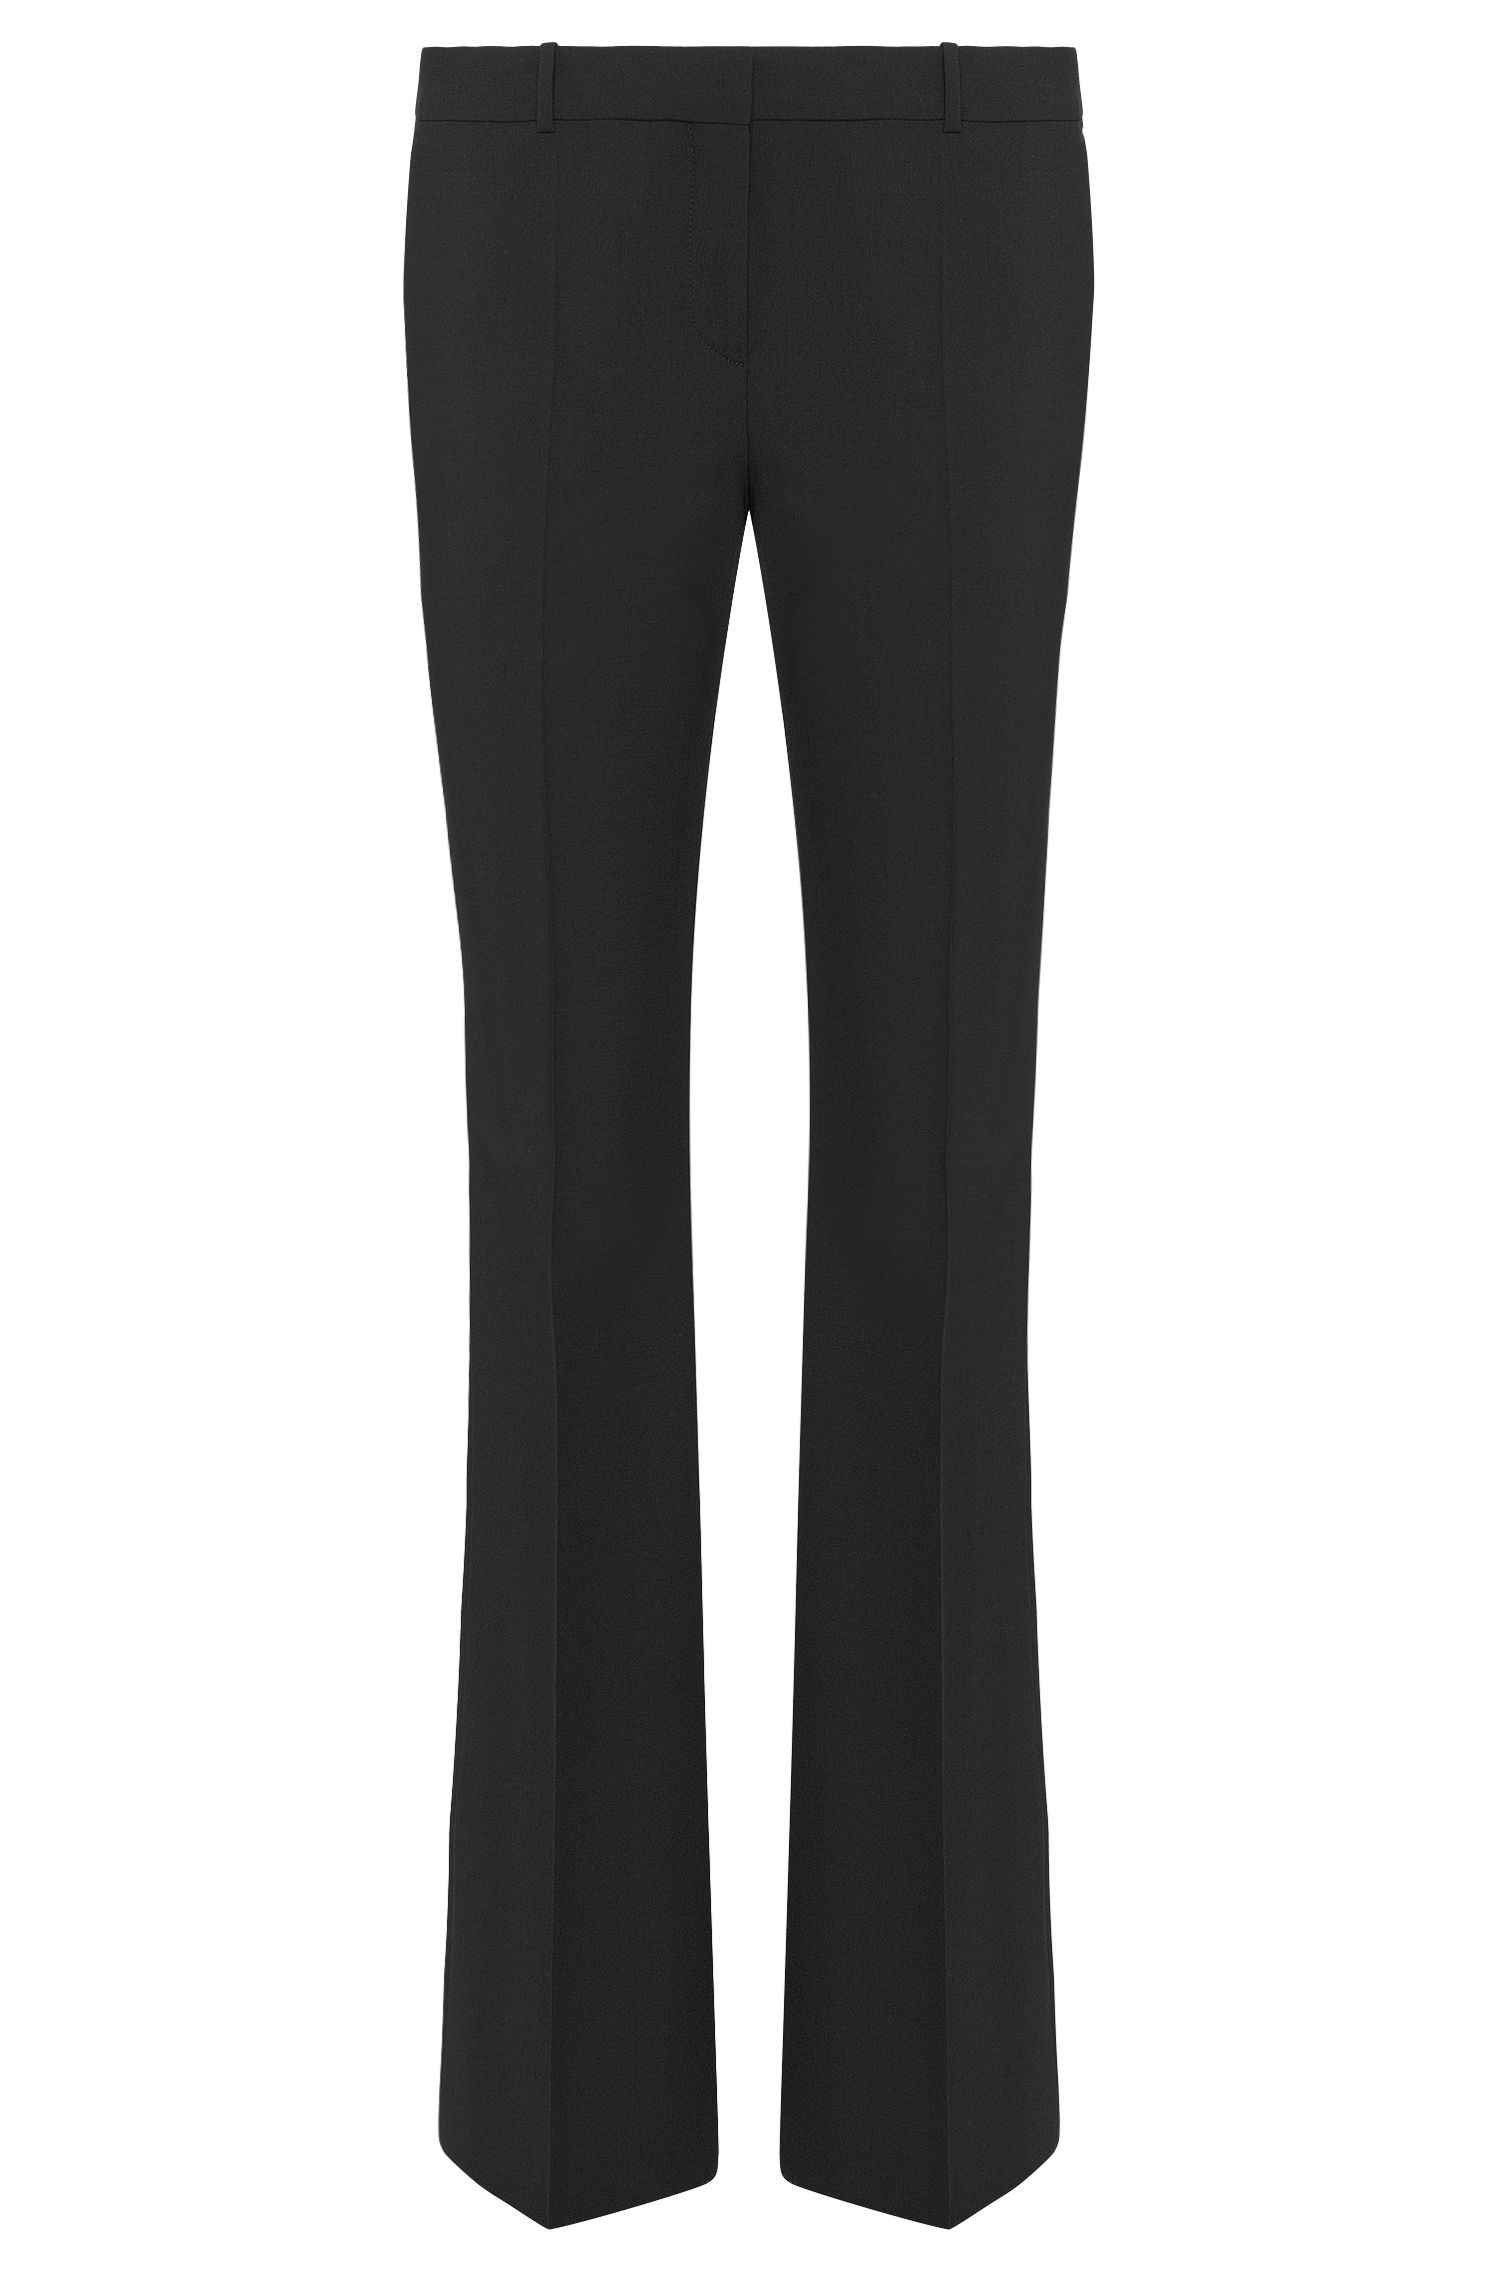 'Tulea Front Zip' | Stretch Virgin Wool Boot Cut Dress Pants